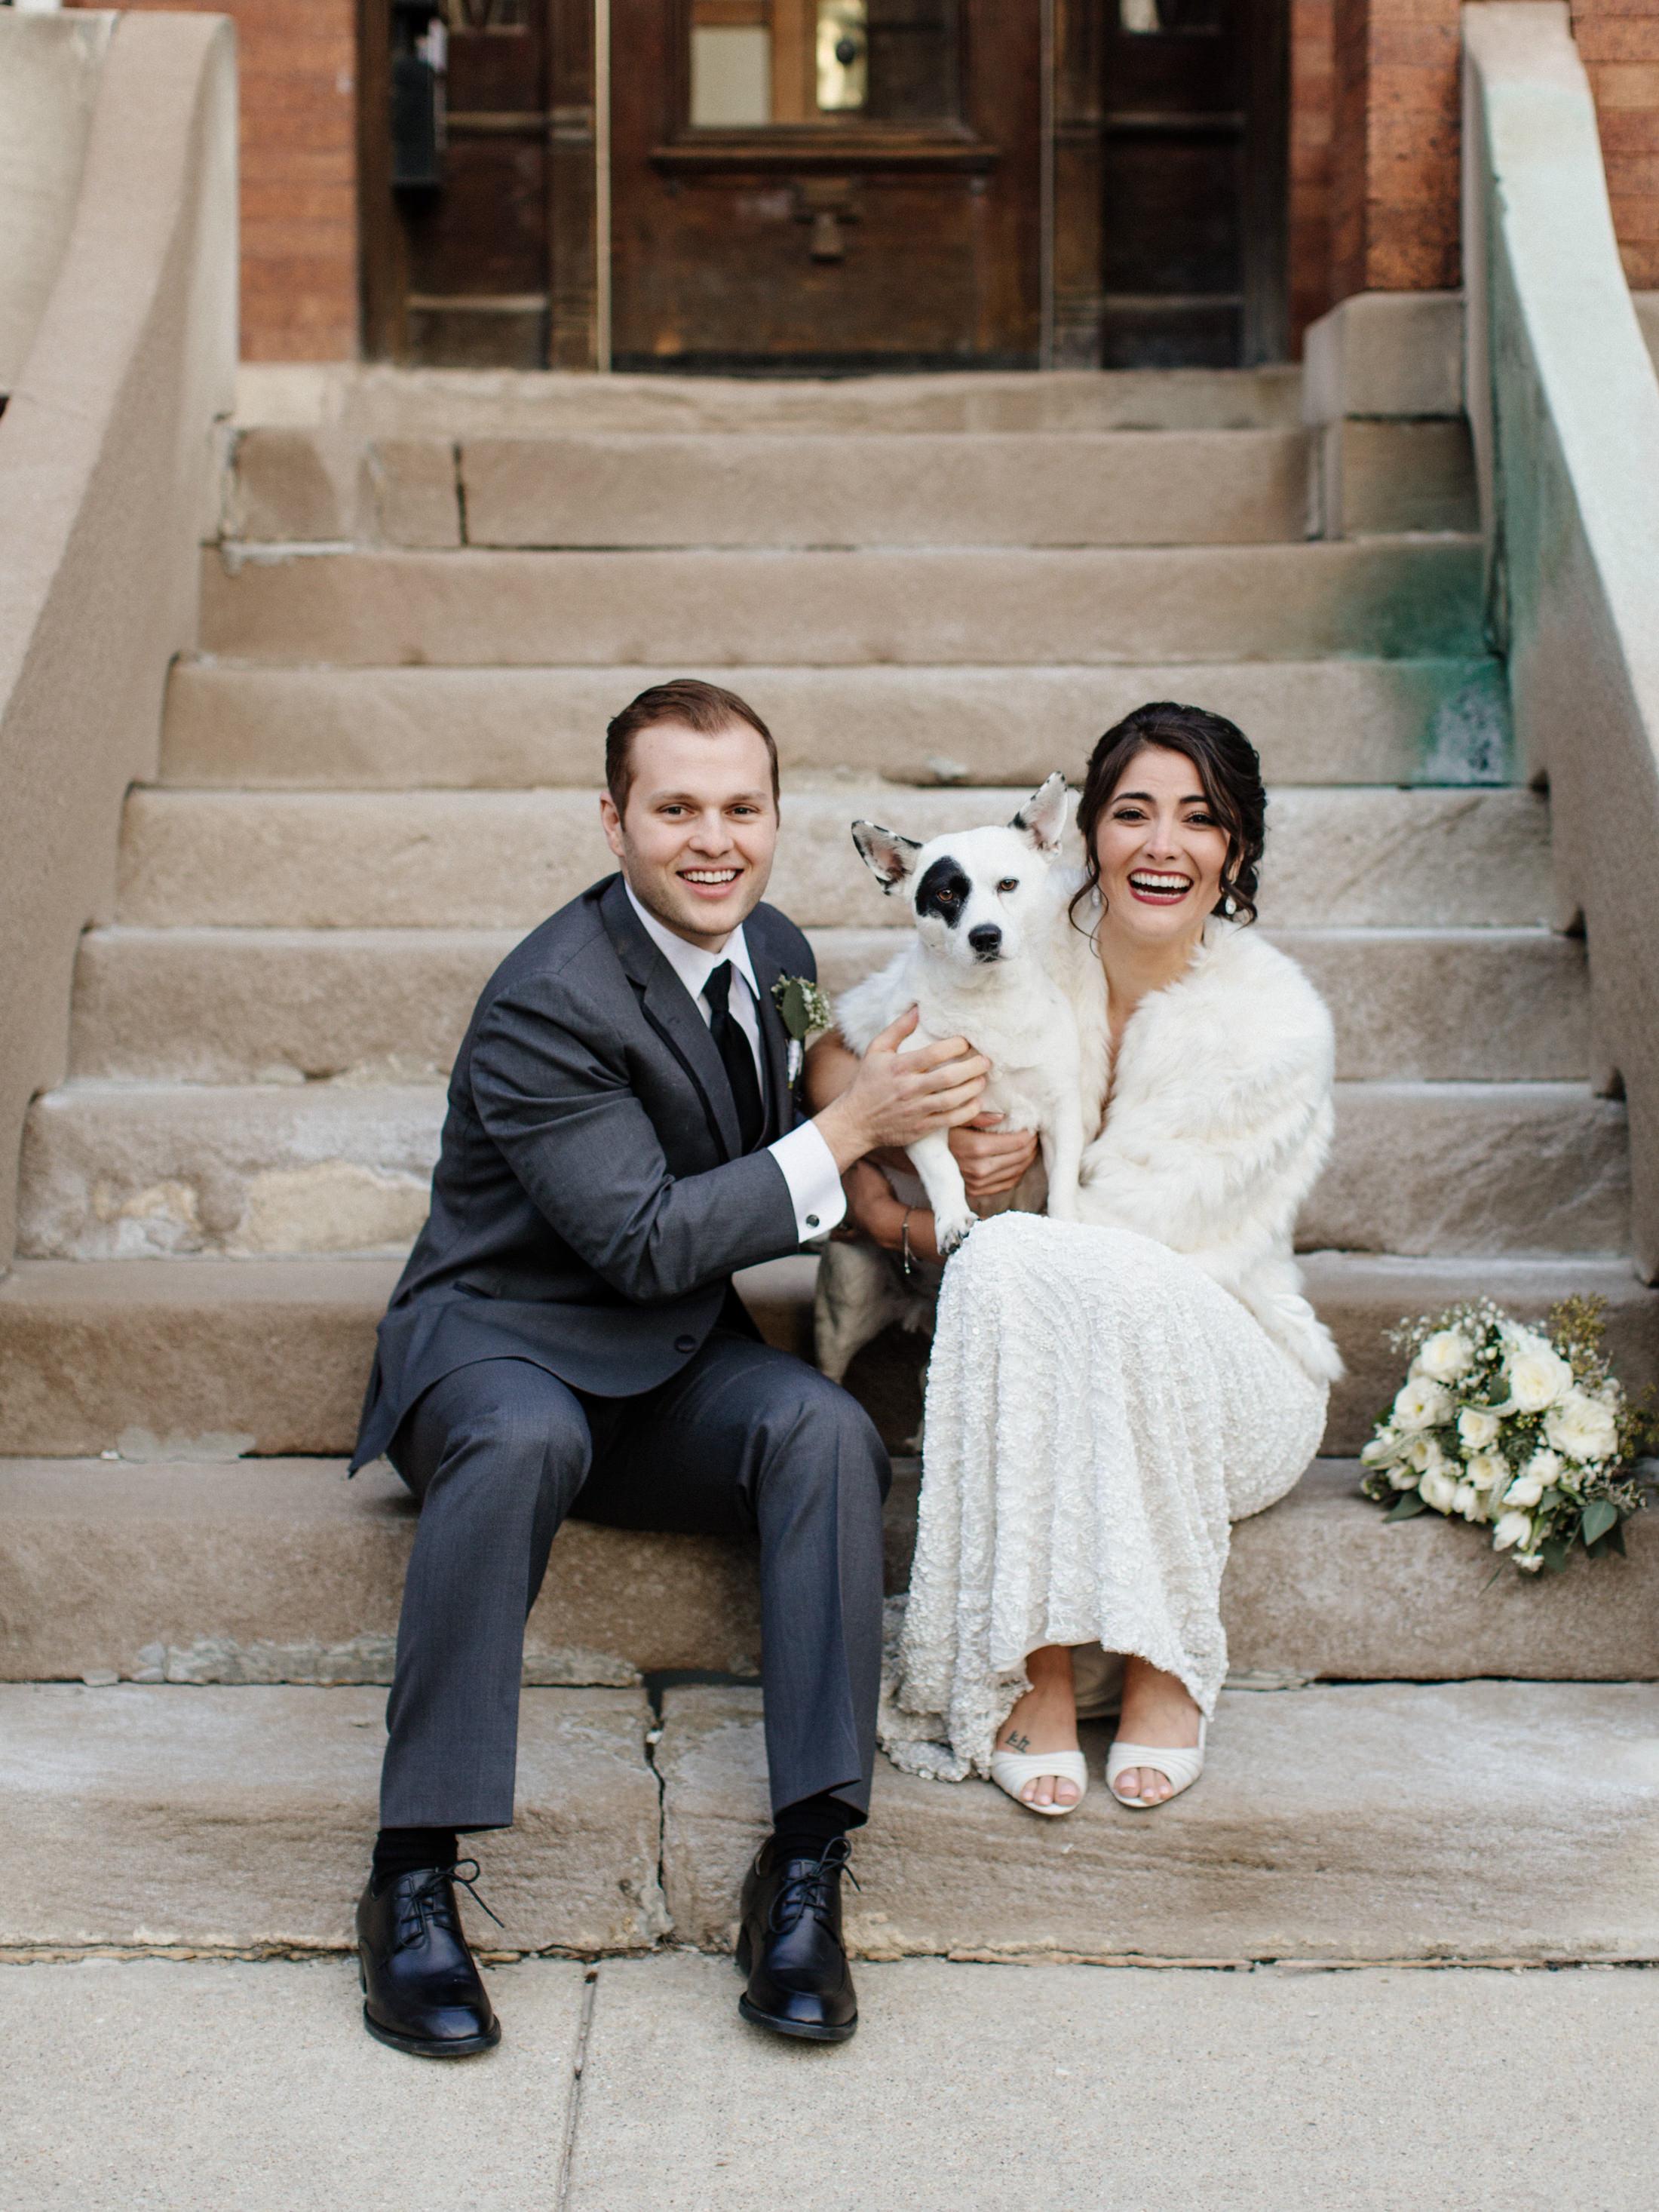 the_bristol_wedding-45.JPG